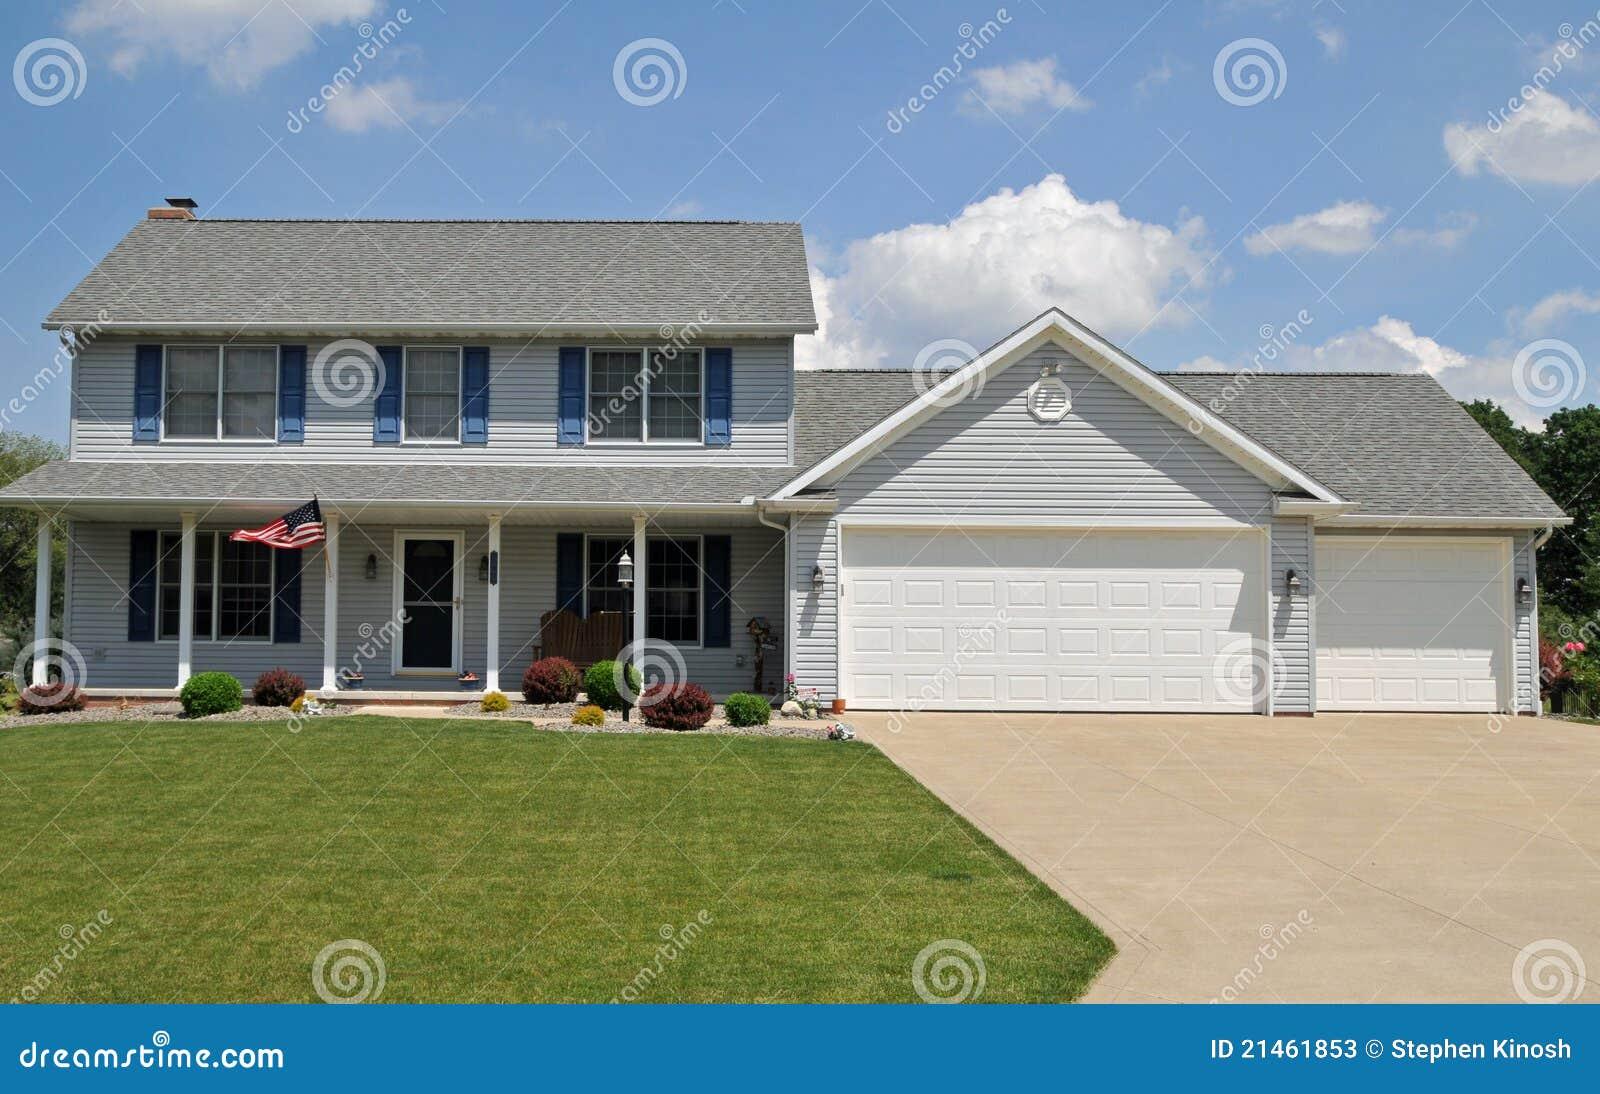 maison coloniale moderne de type photos stock image 21461853. Black Bedroom Furniture Sets. Home Design Ideas